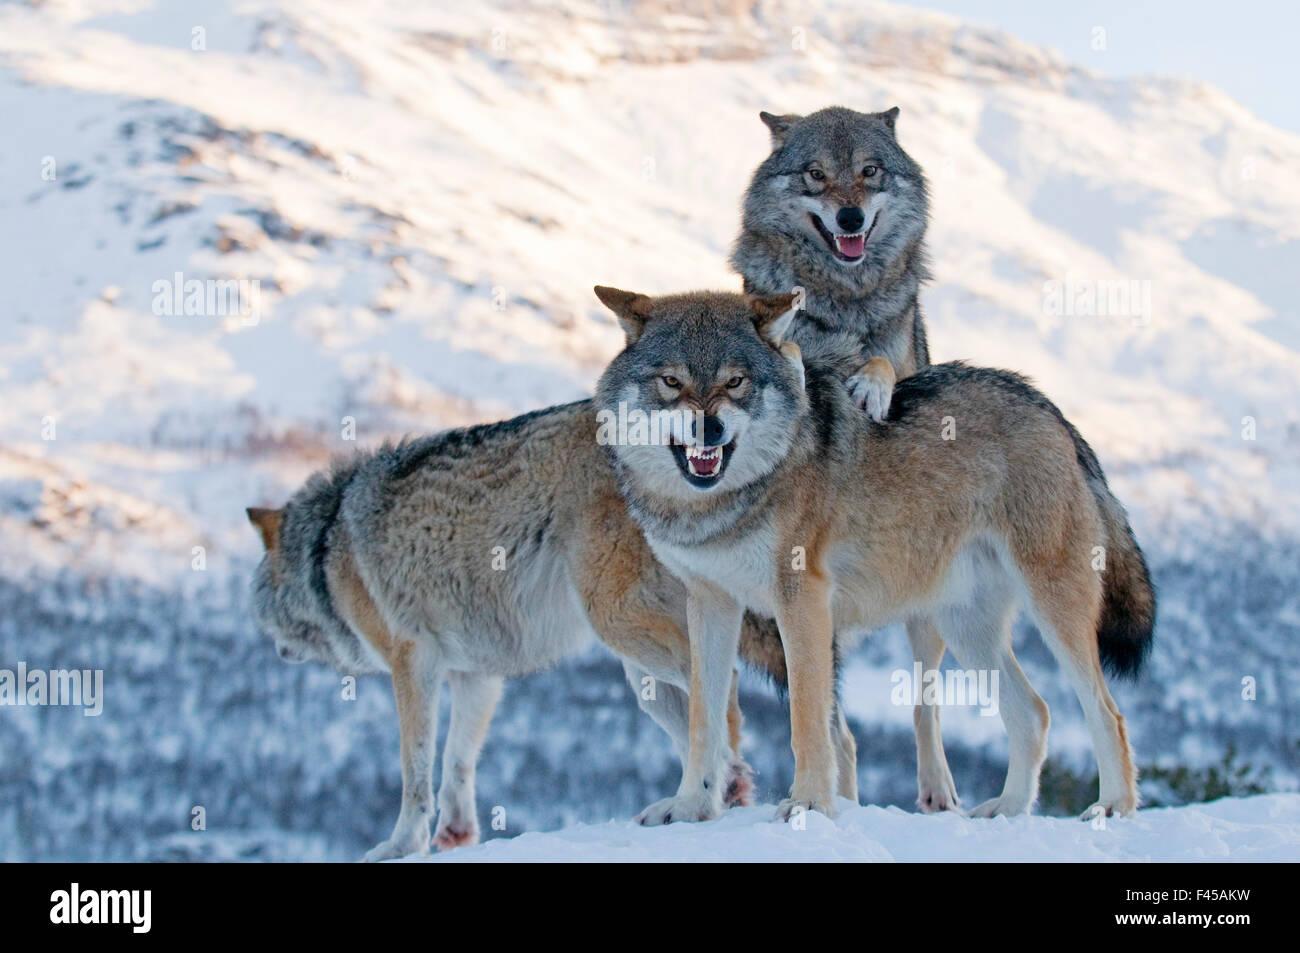 Three European grey wolves (Canis lupus), captive, Norway, February. Stock Photo